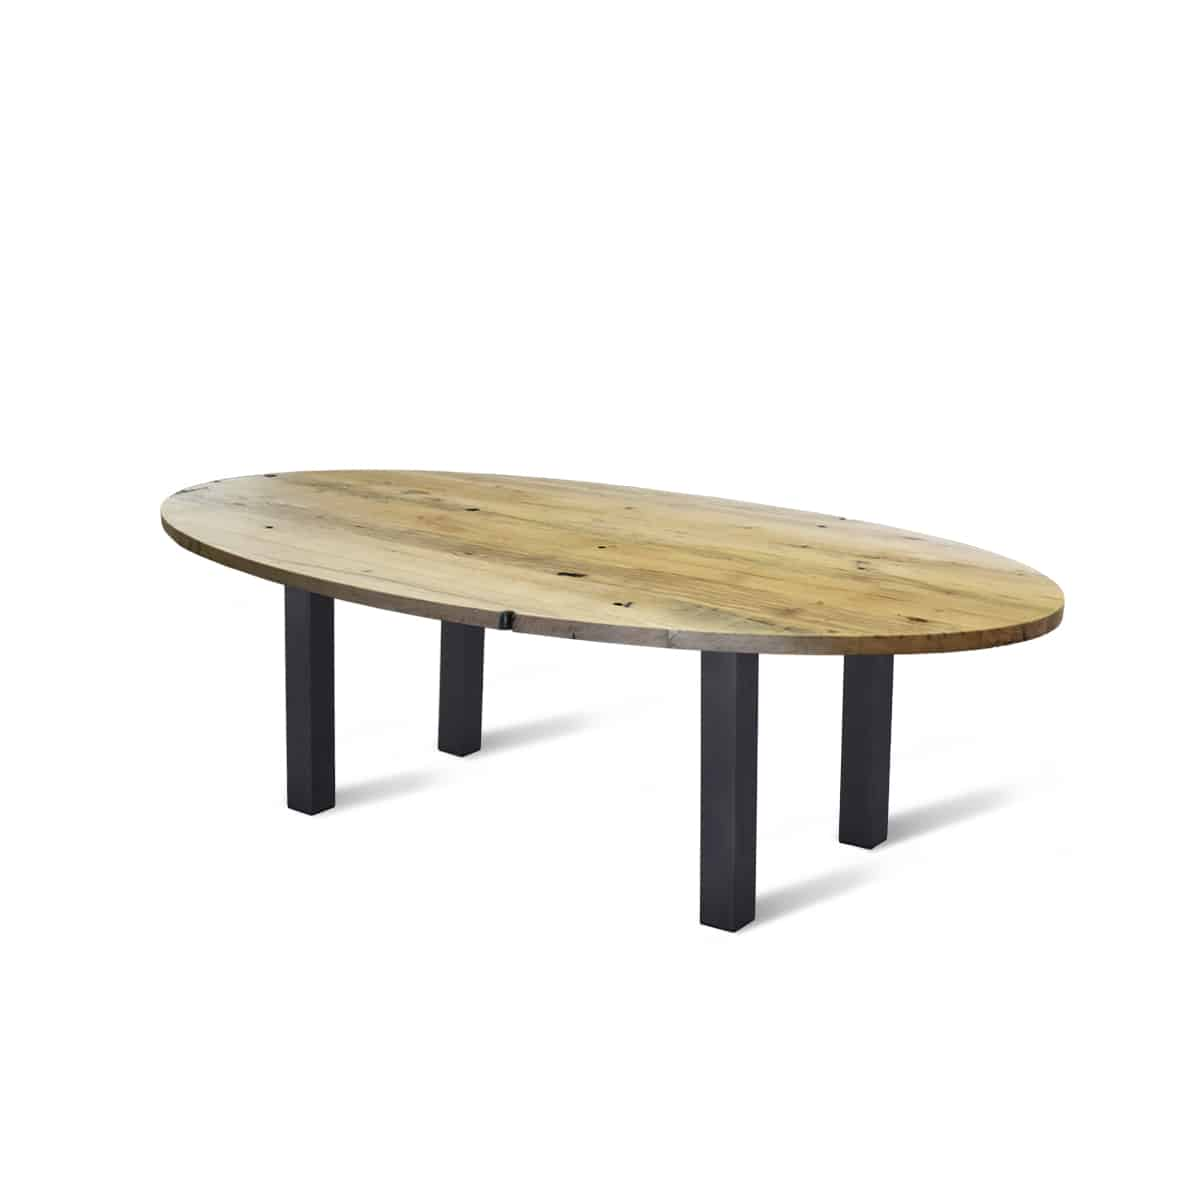 Ovaal ovale massief eiken houten wagonhout rustiek tafel eetkamer keuken staal stalen poten onderstel